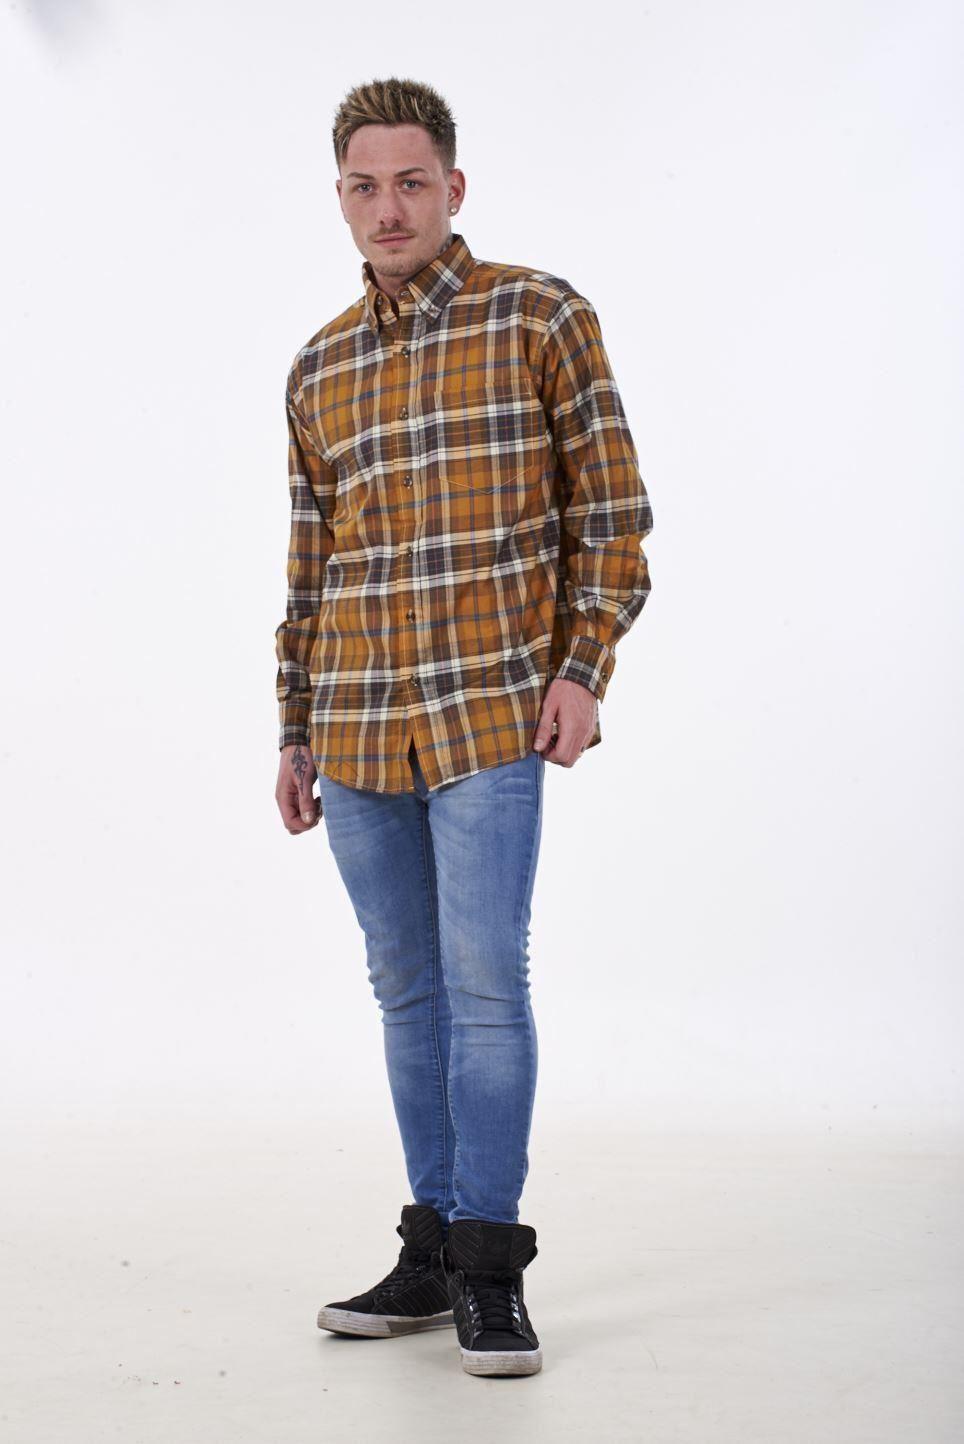 Mens Checked Shirt Malay Apparel Cotton Casual Wear Long Sleeve Button Top M-2XL